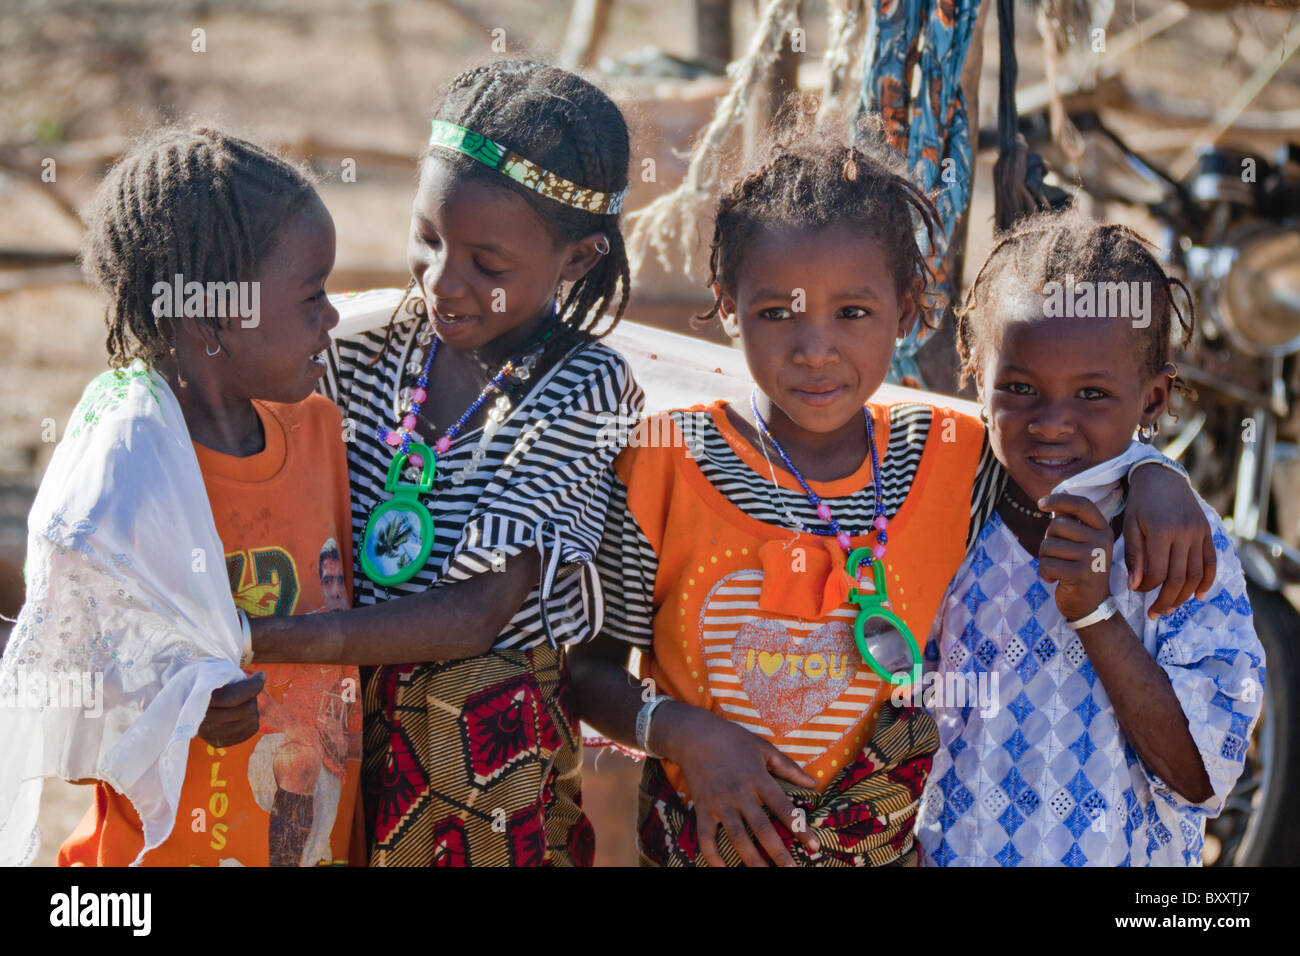 Fulani Children. Photo: Alamy